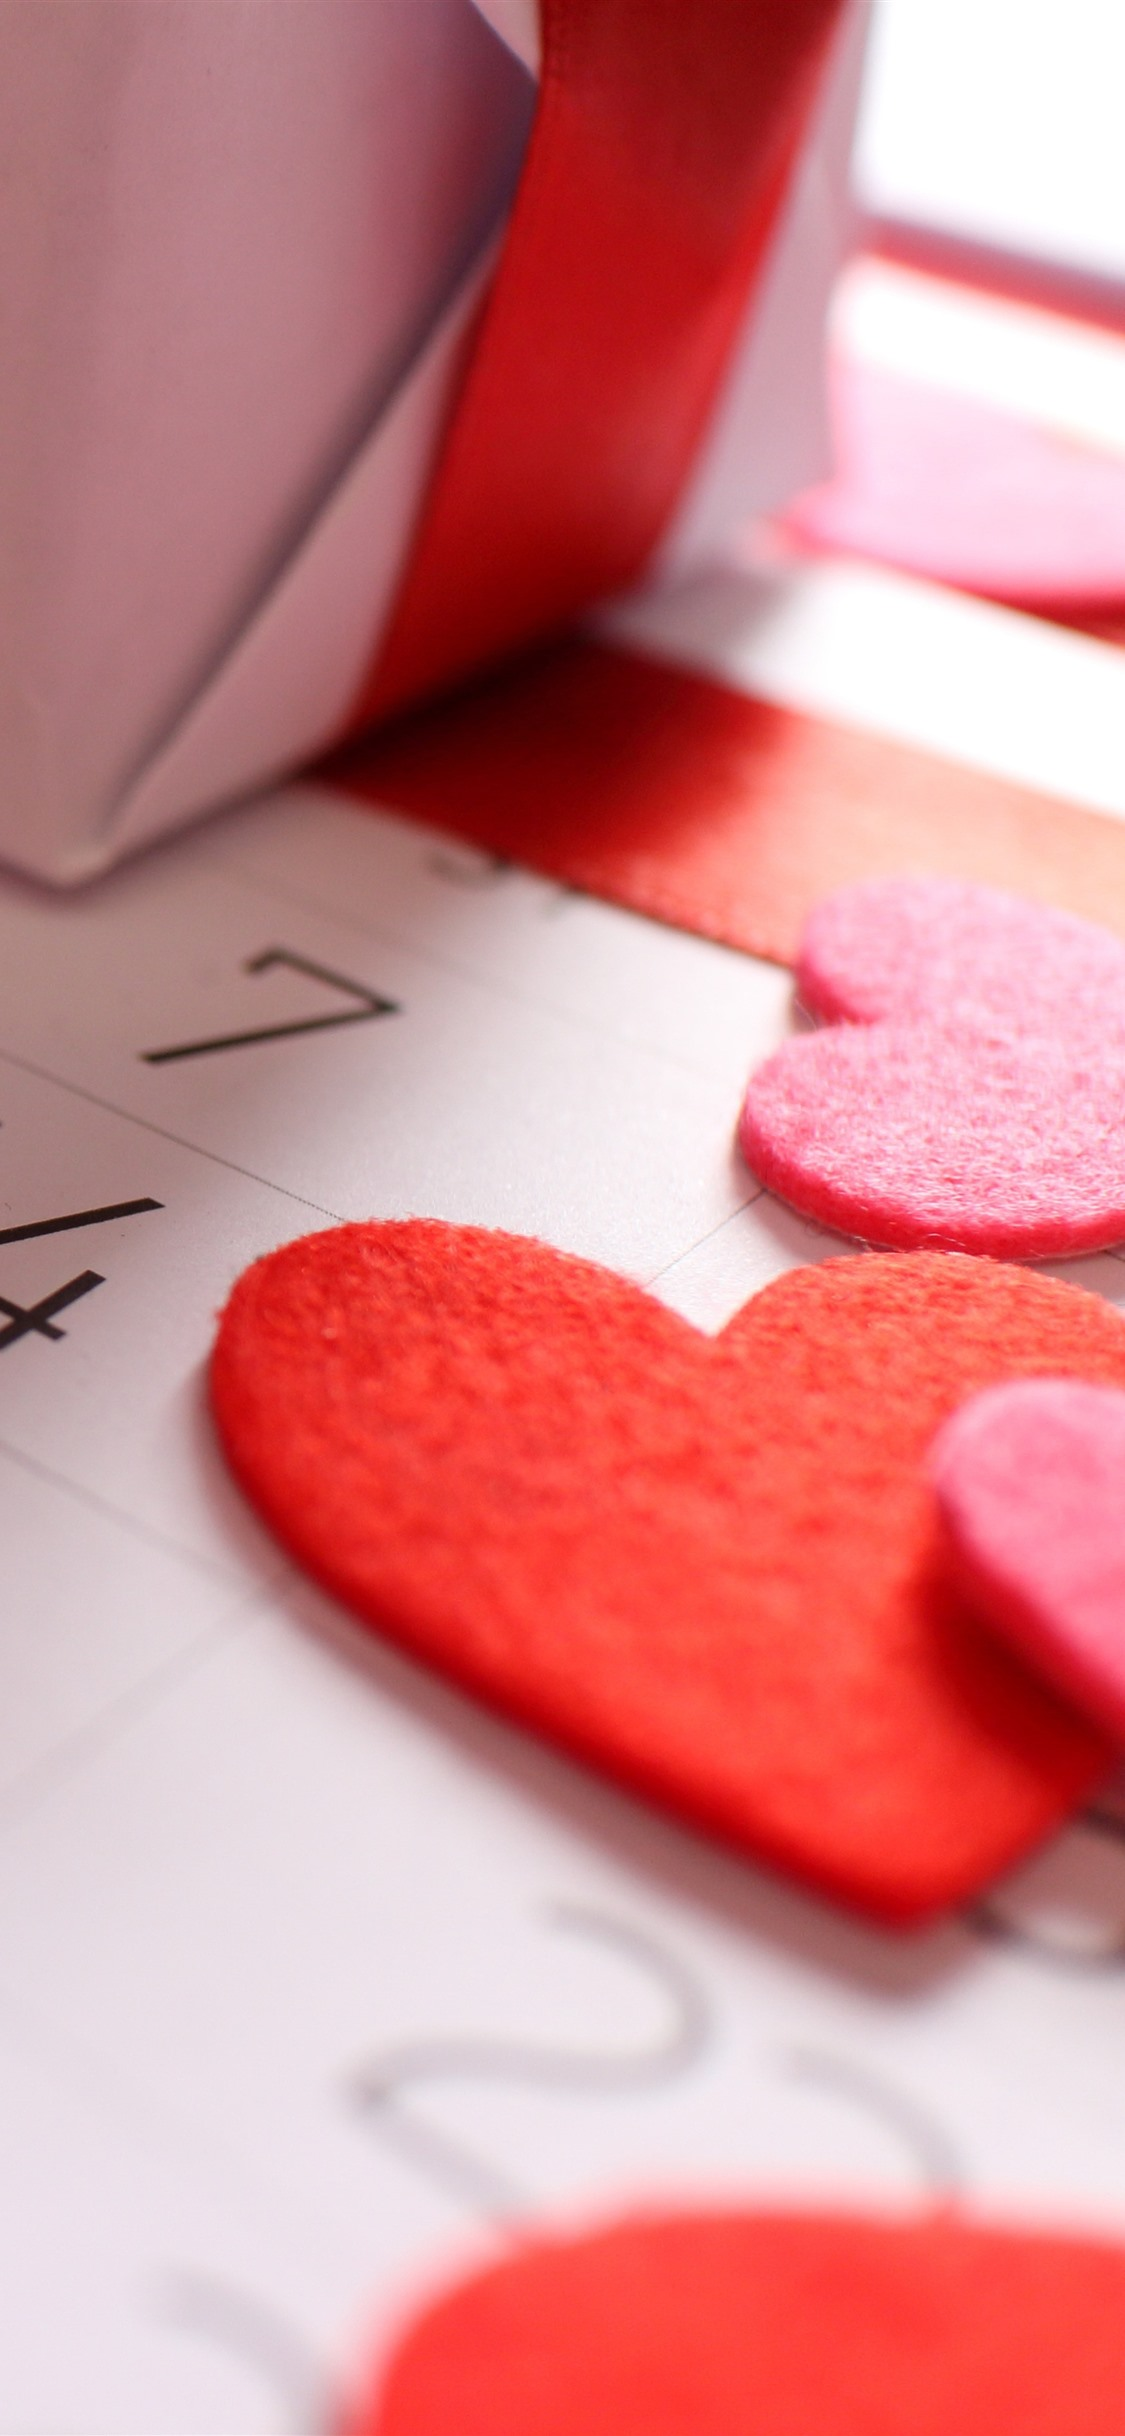 Love Hearts Calendar Gift Valentine Day 1242x2688 Iphone